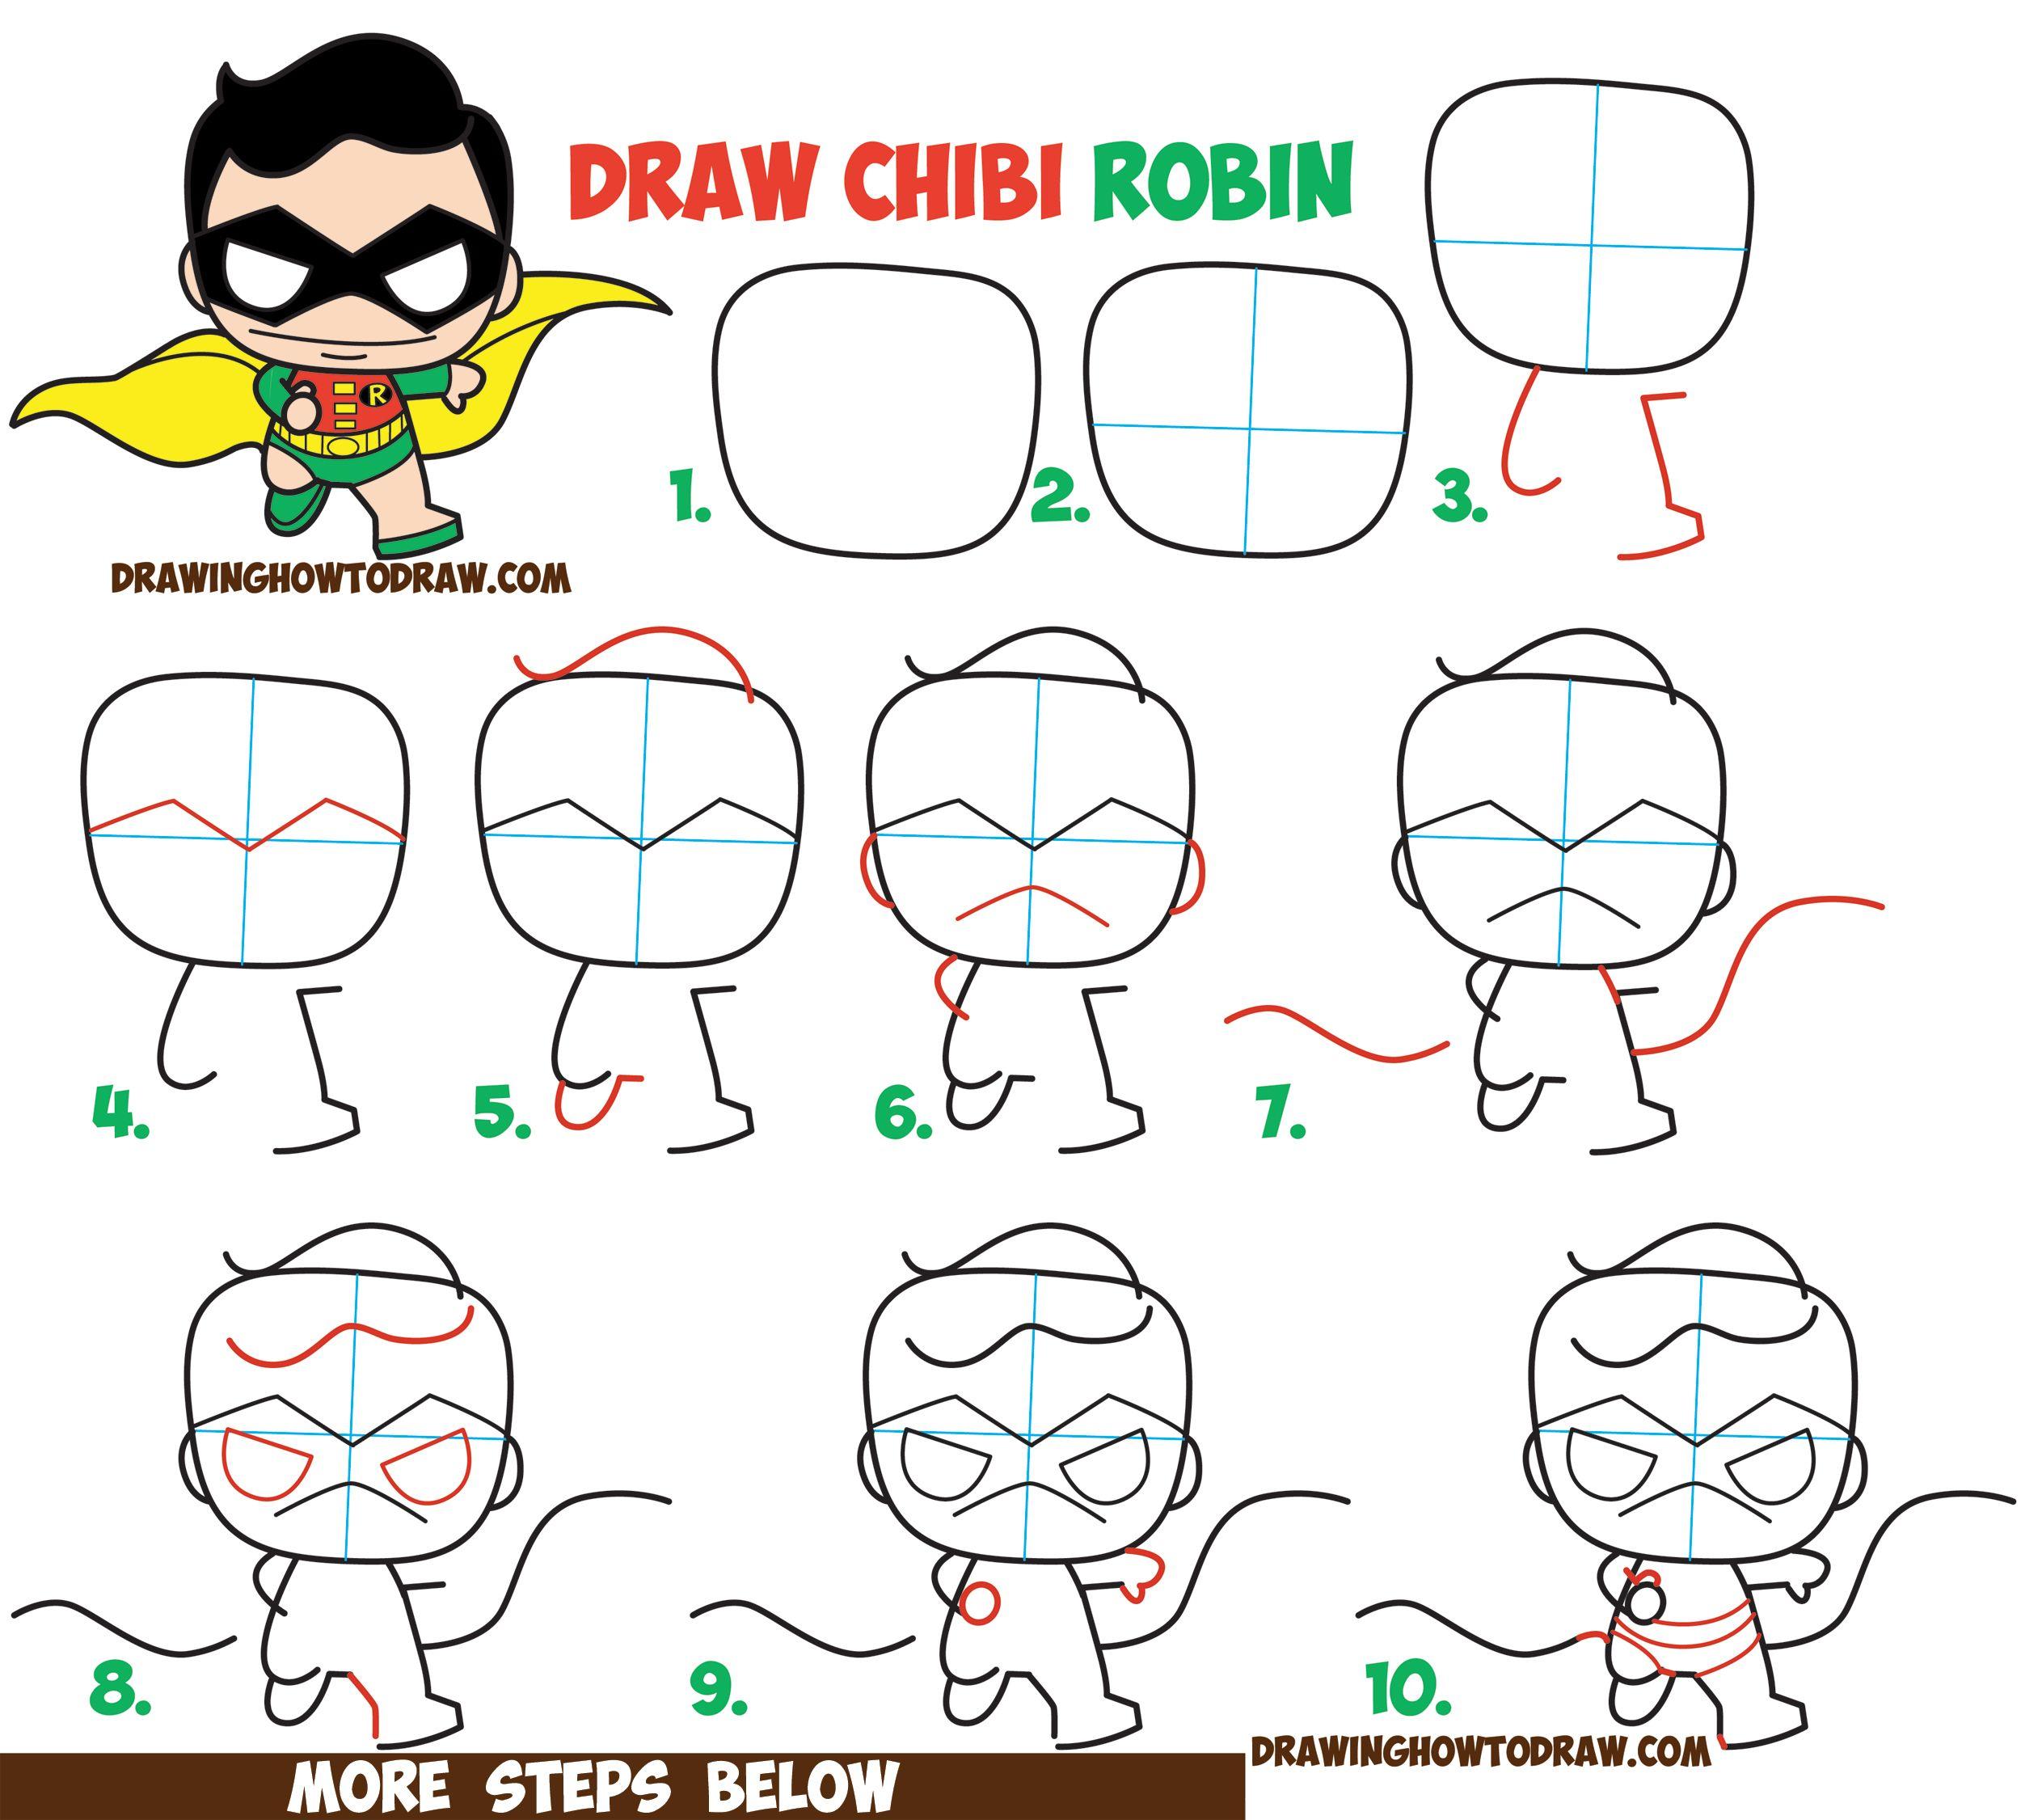 2500x2251 How To Draw Cute Kawaii Chibi Robin From Dc Comics' Batman